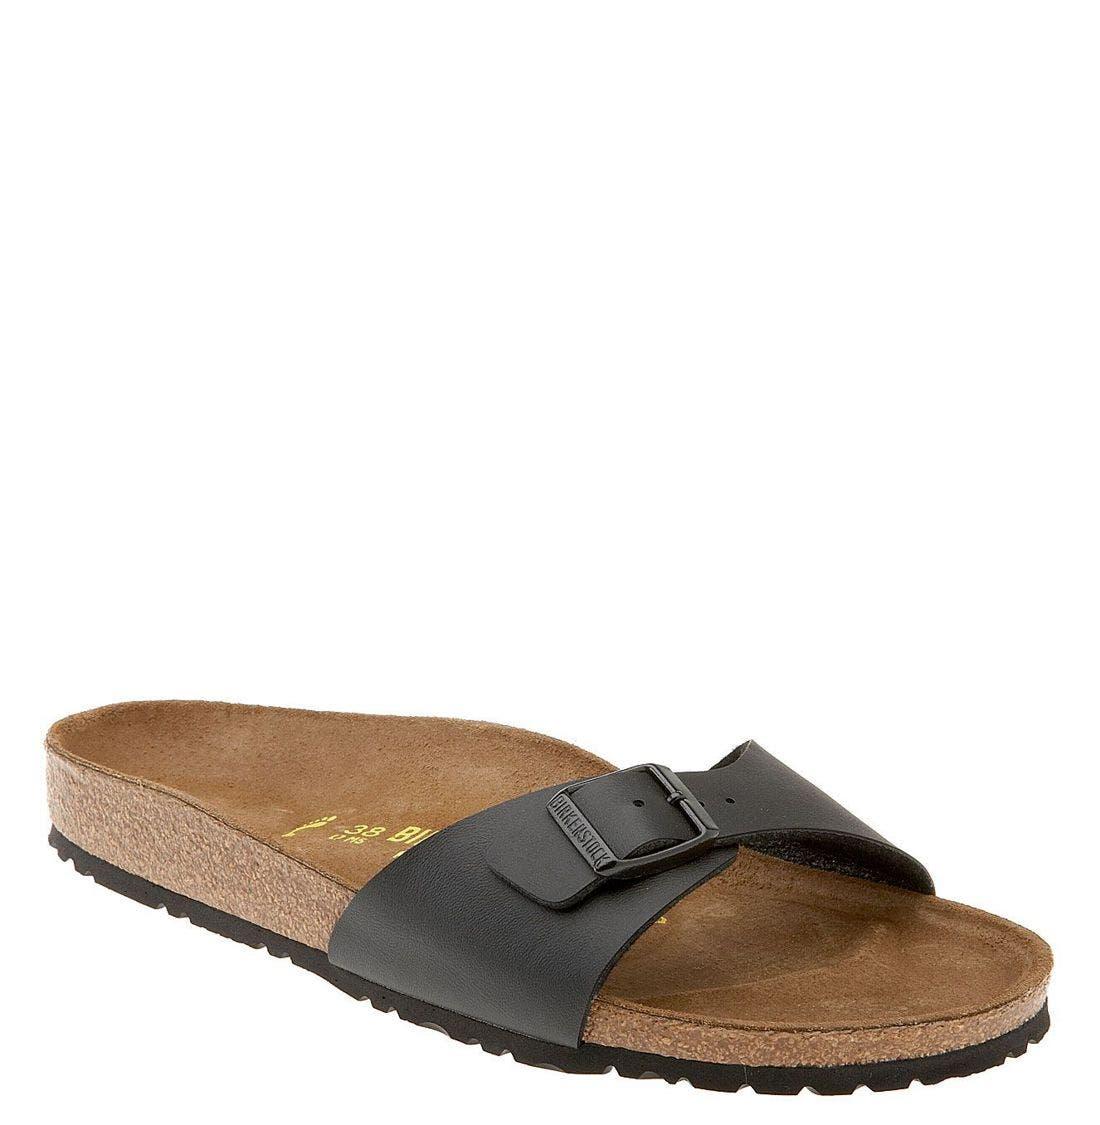 5e650b3ab8b Women s Birkenstock Sandals